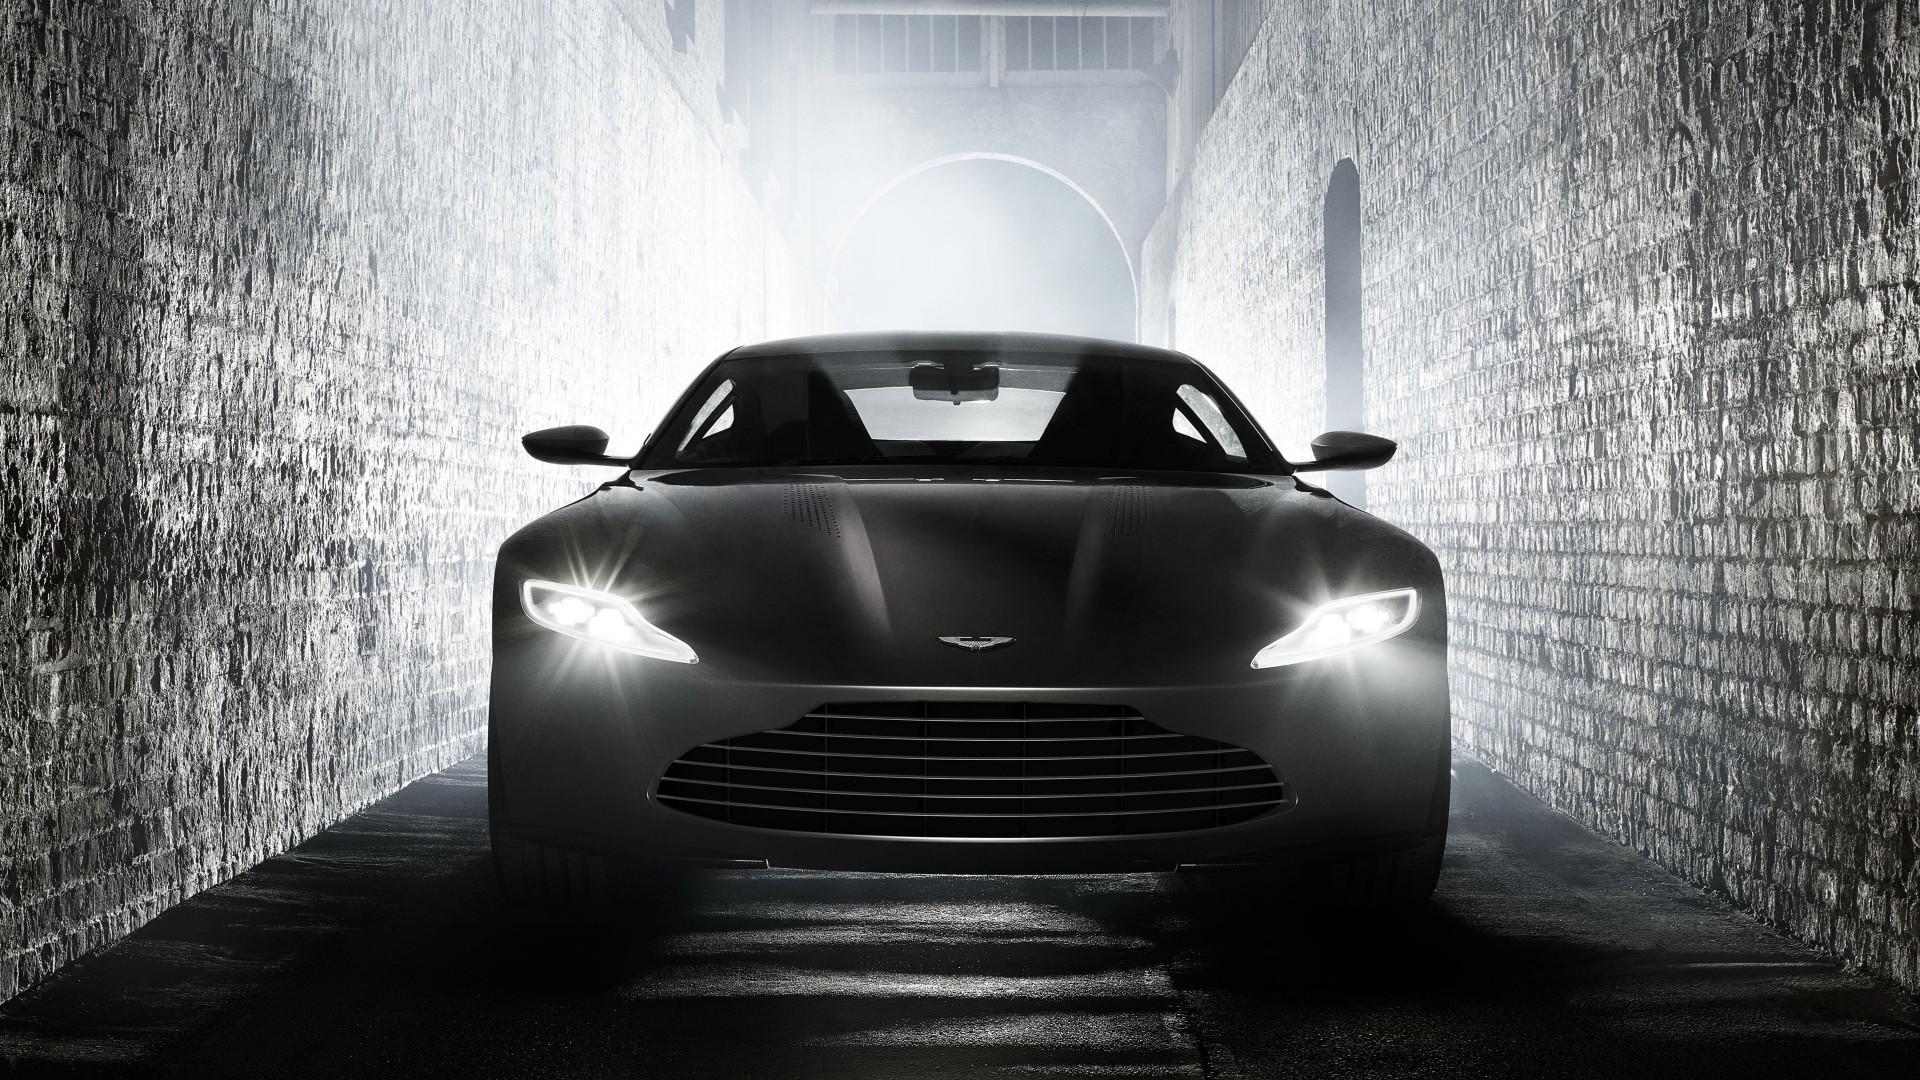 Audi Full Hd Wallpaper Download Aston Martin Db10 Spectre 4k Wallpaper Hd Car Wallpapers